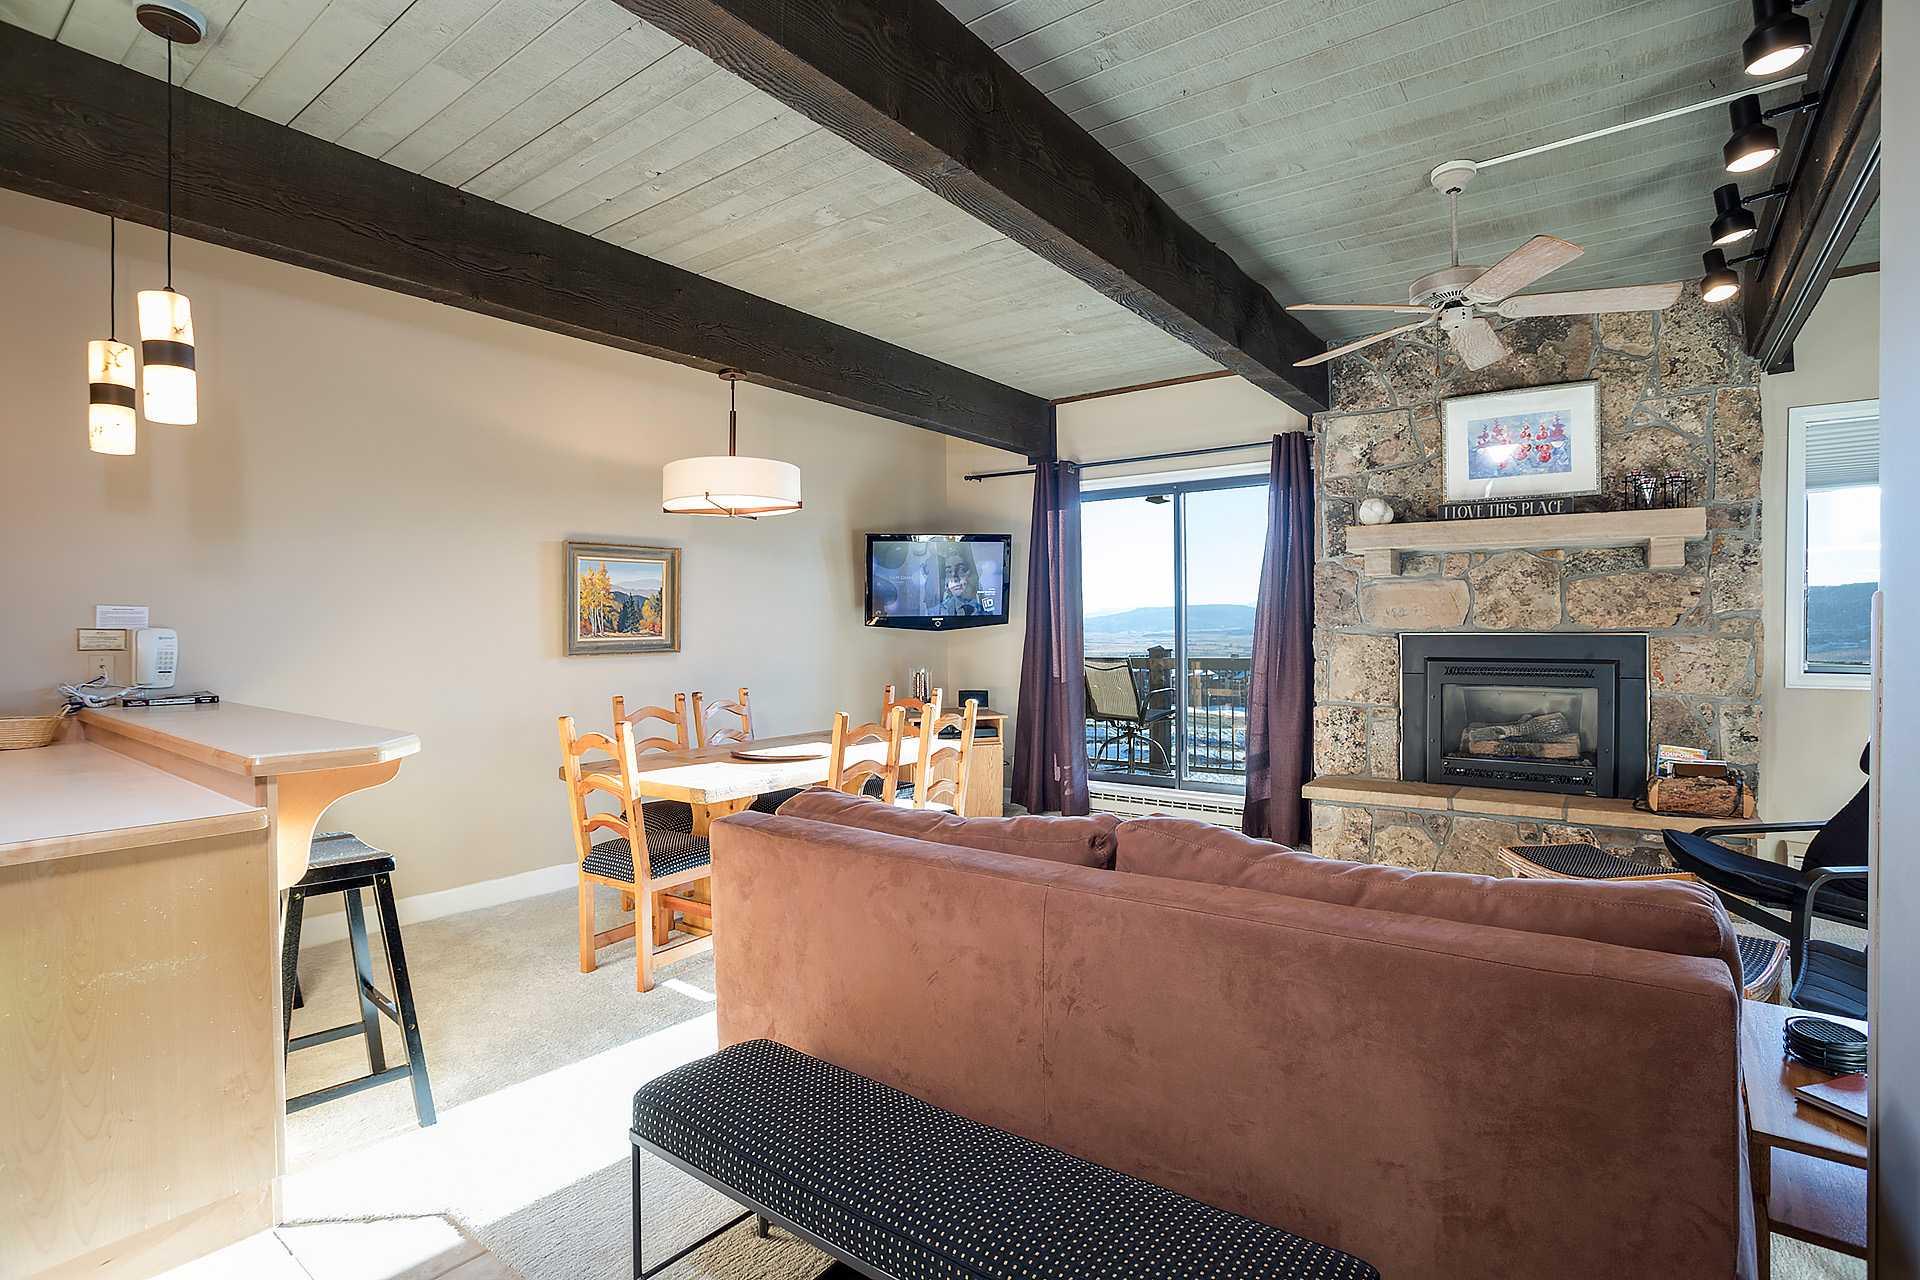 CA315: Storm Meadows Club A Condominiums